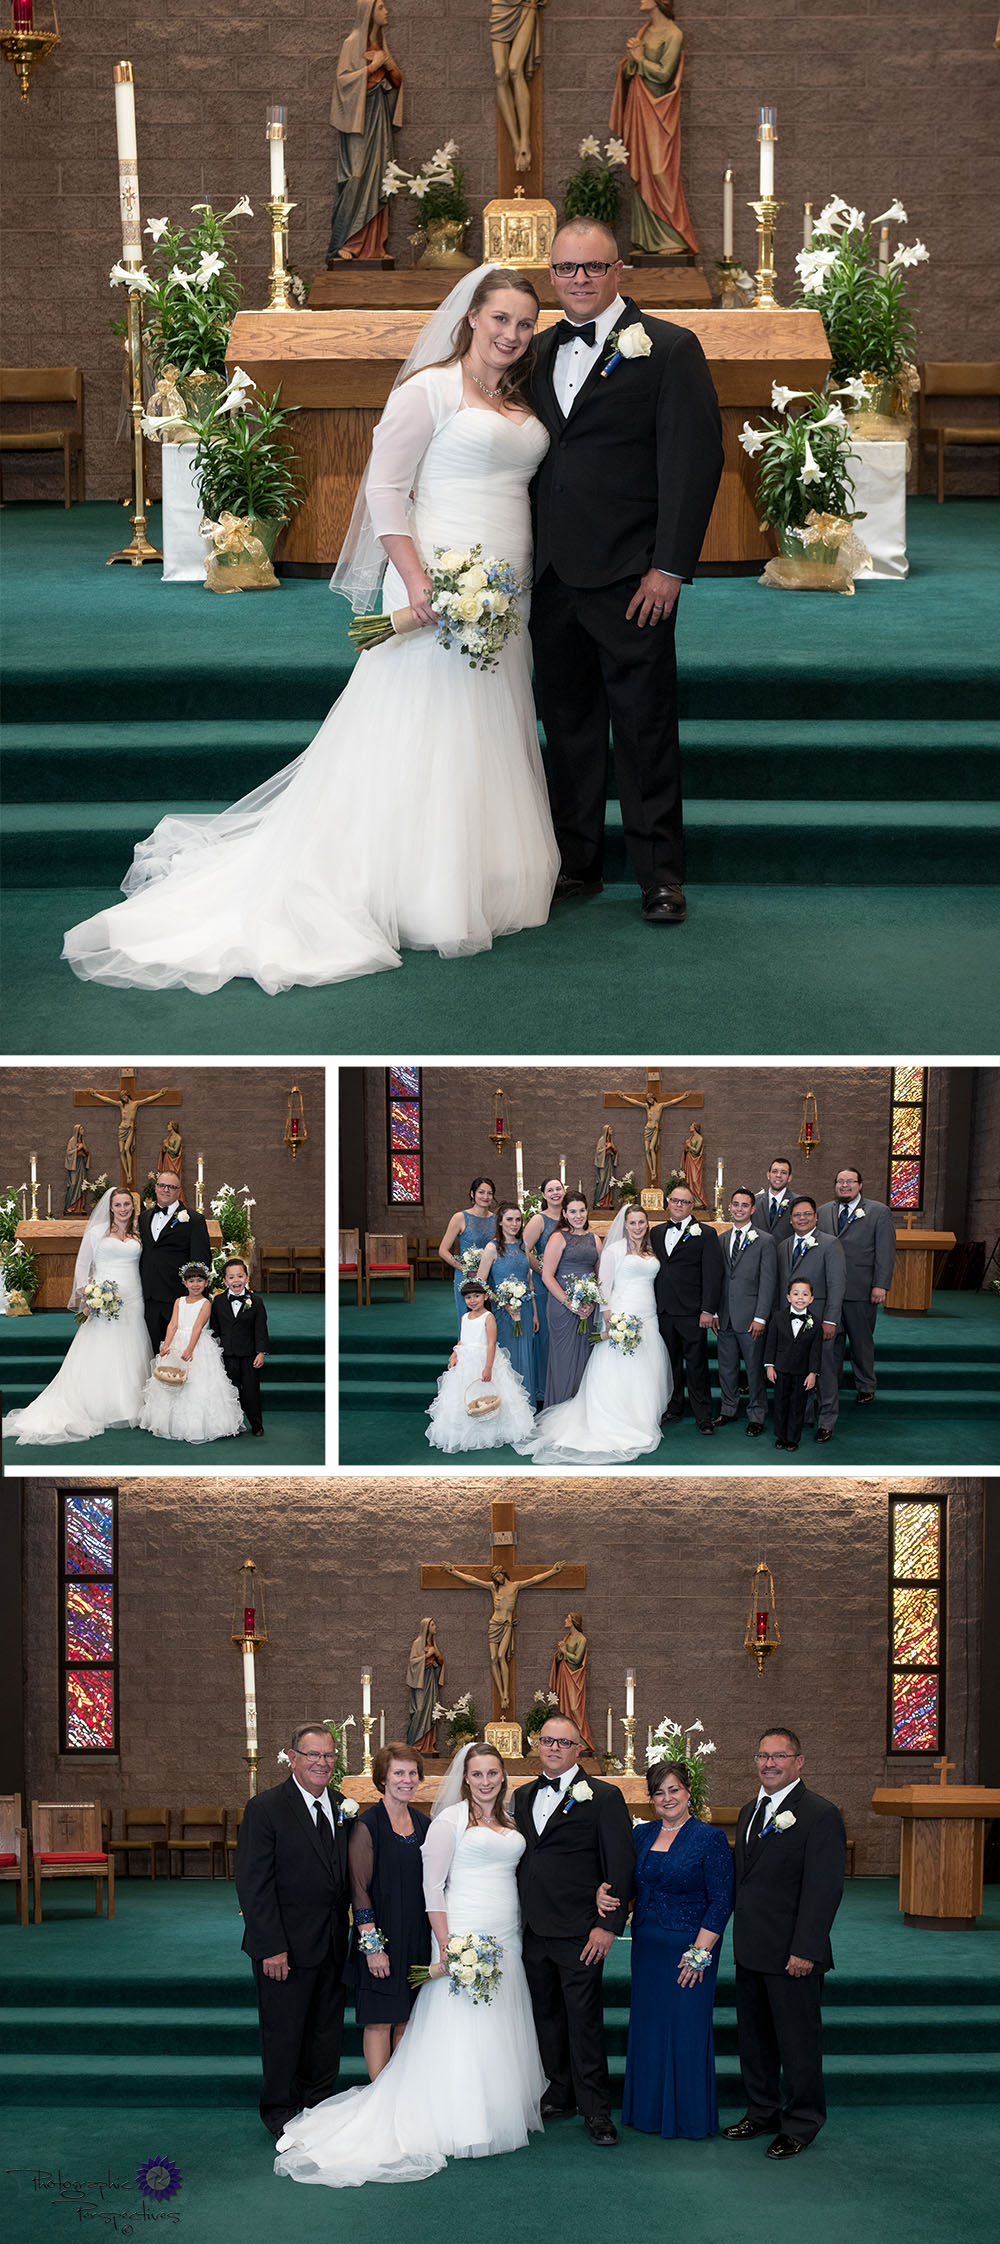 Noah's Event Venue Wedding | Amy + Pihilip